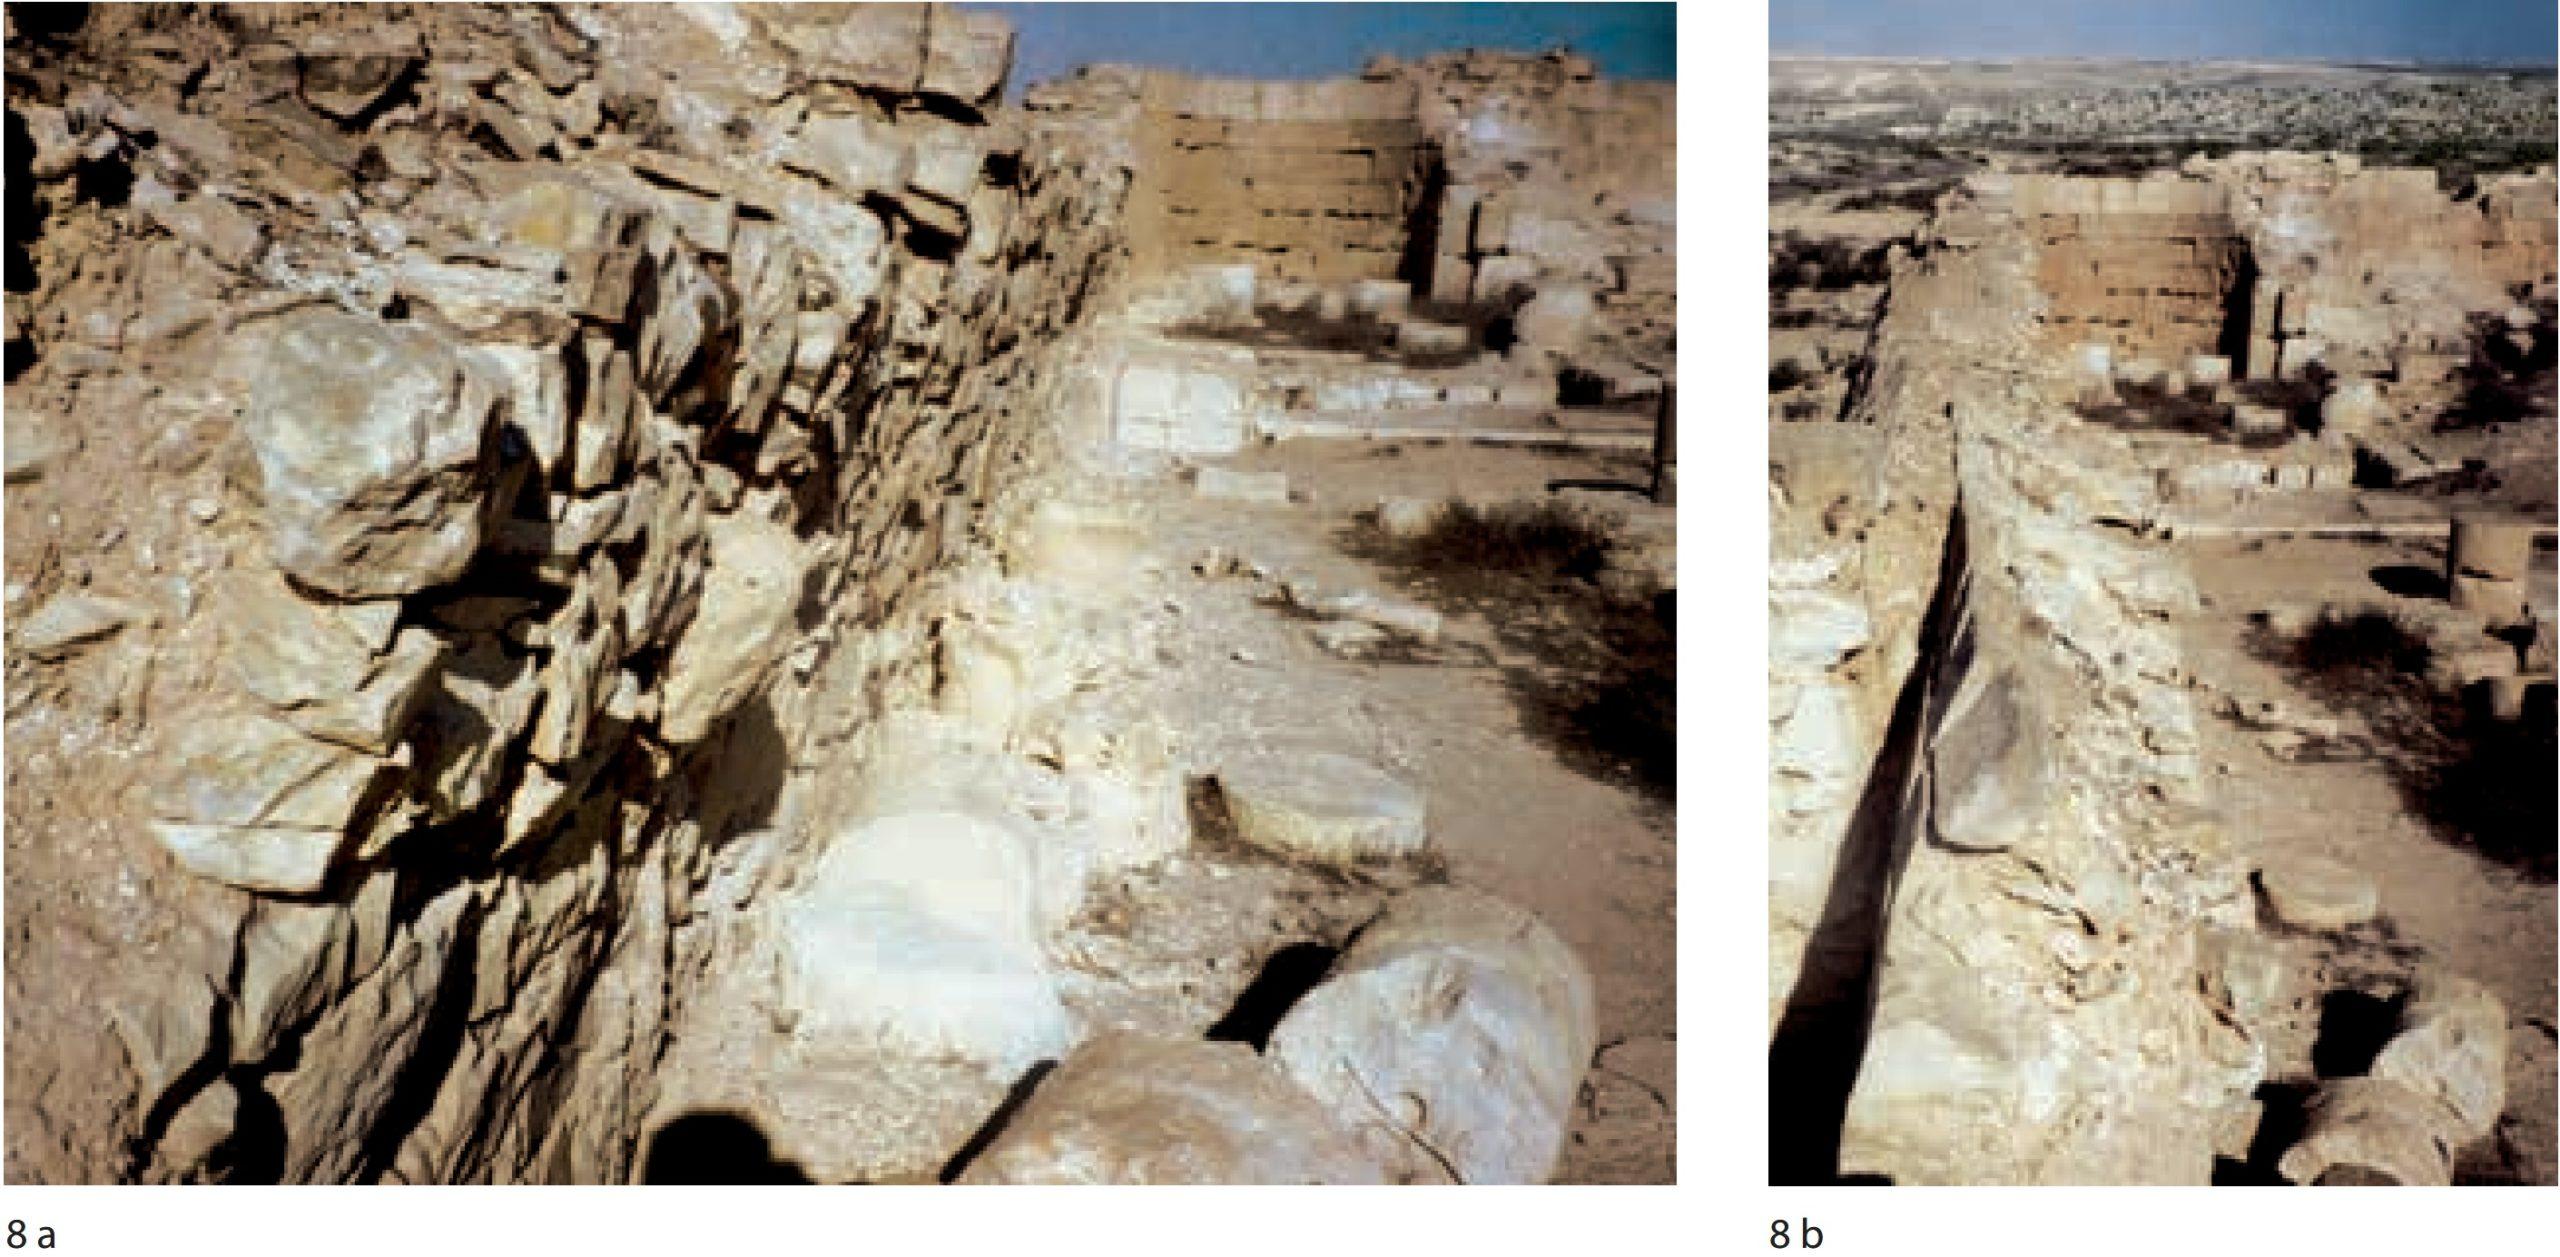 Tilted Walls at Rehobot ba Negev